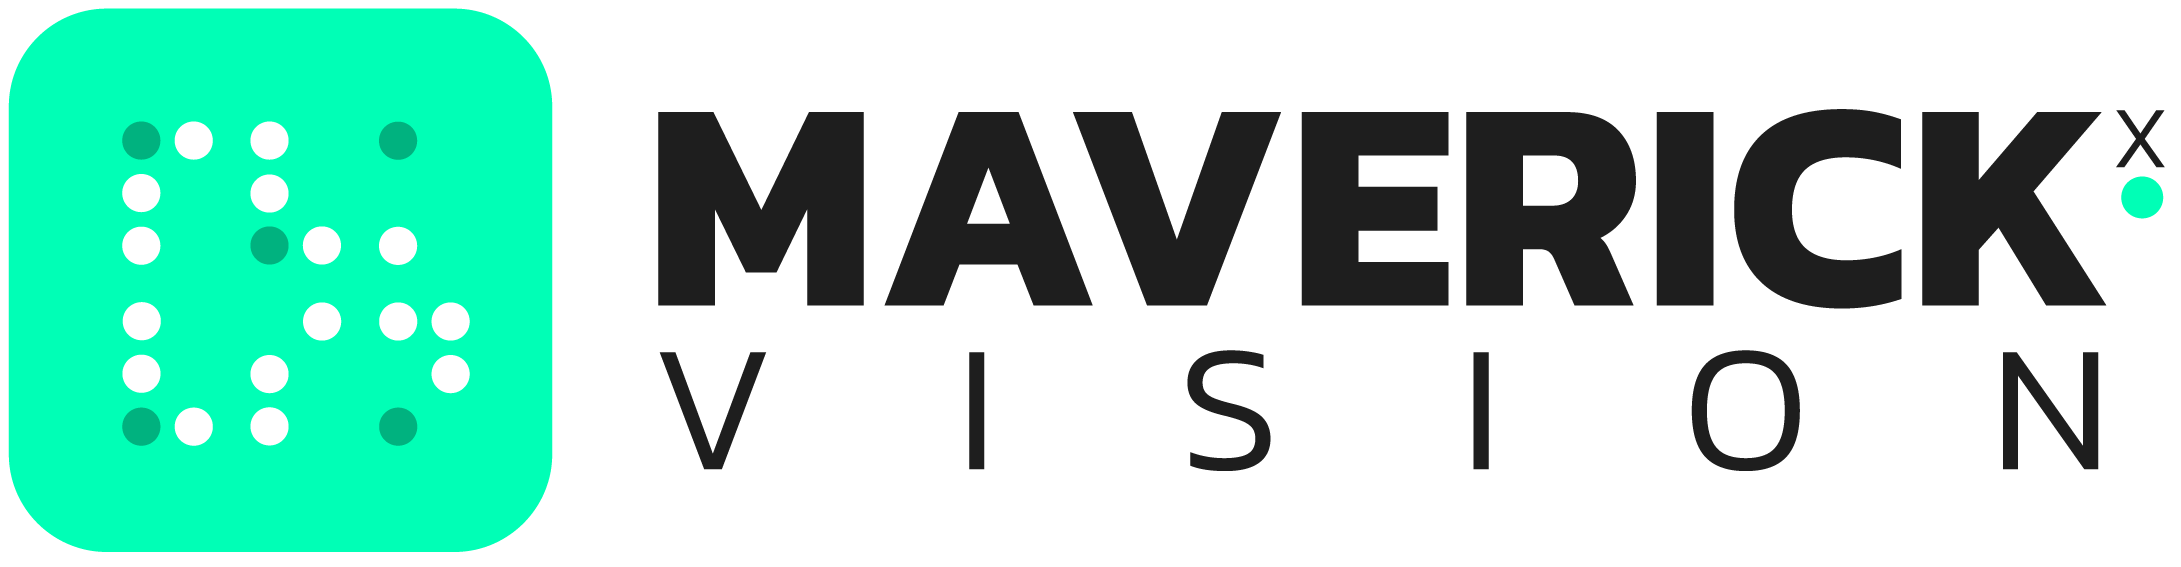 Maverick Vision